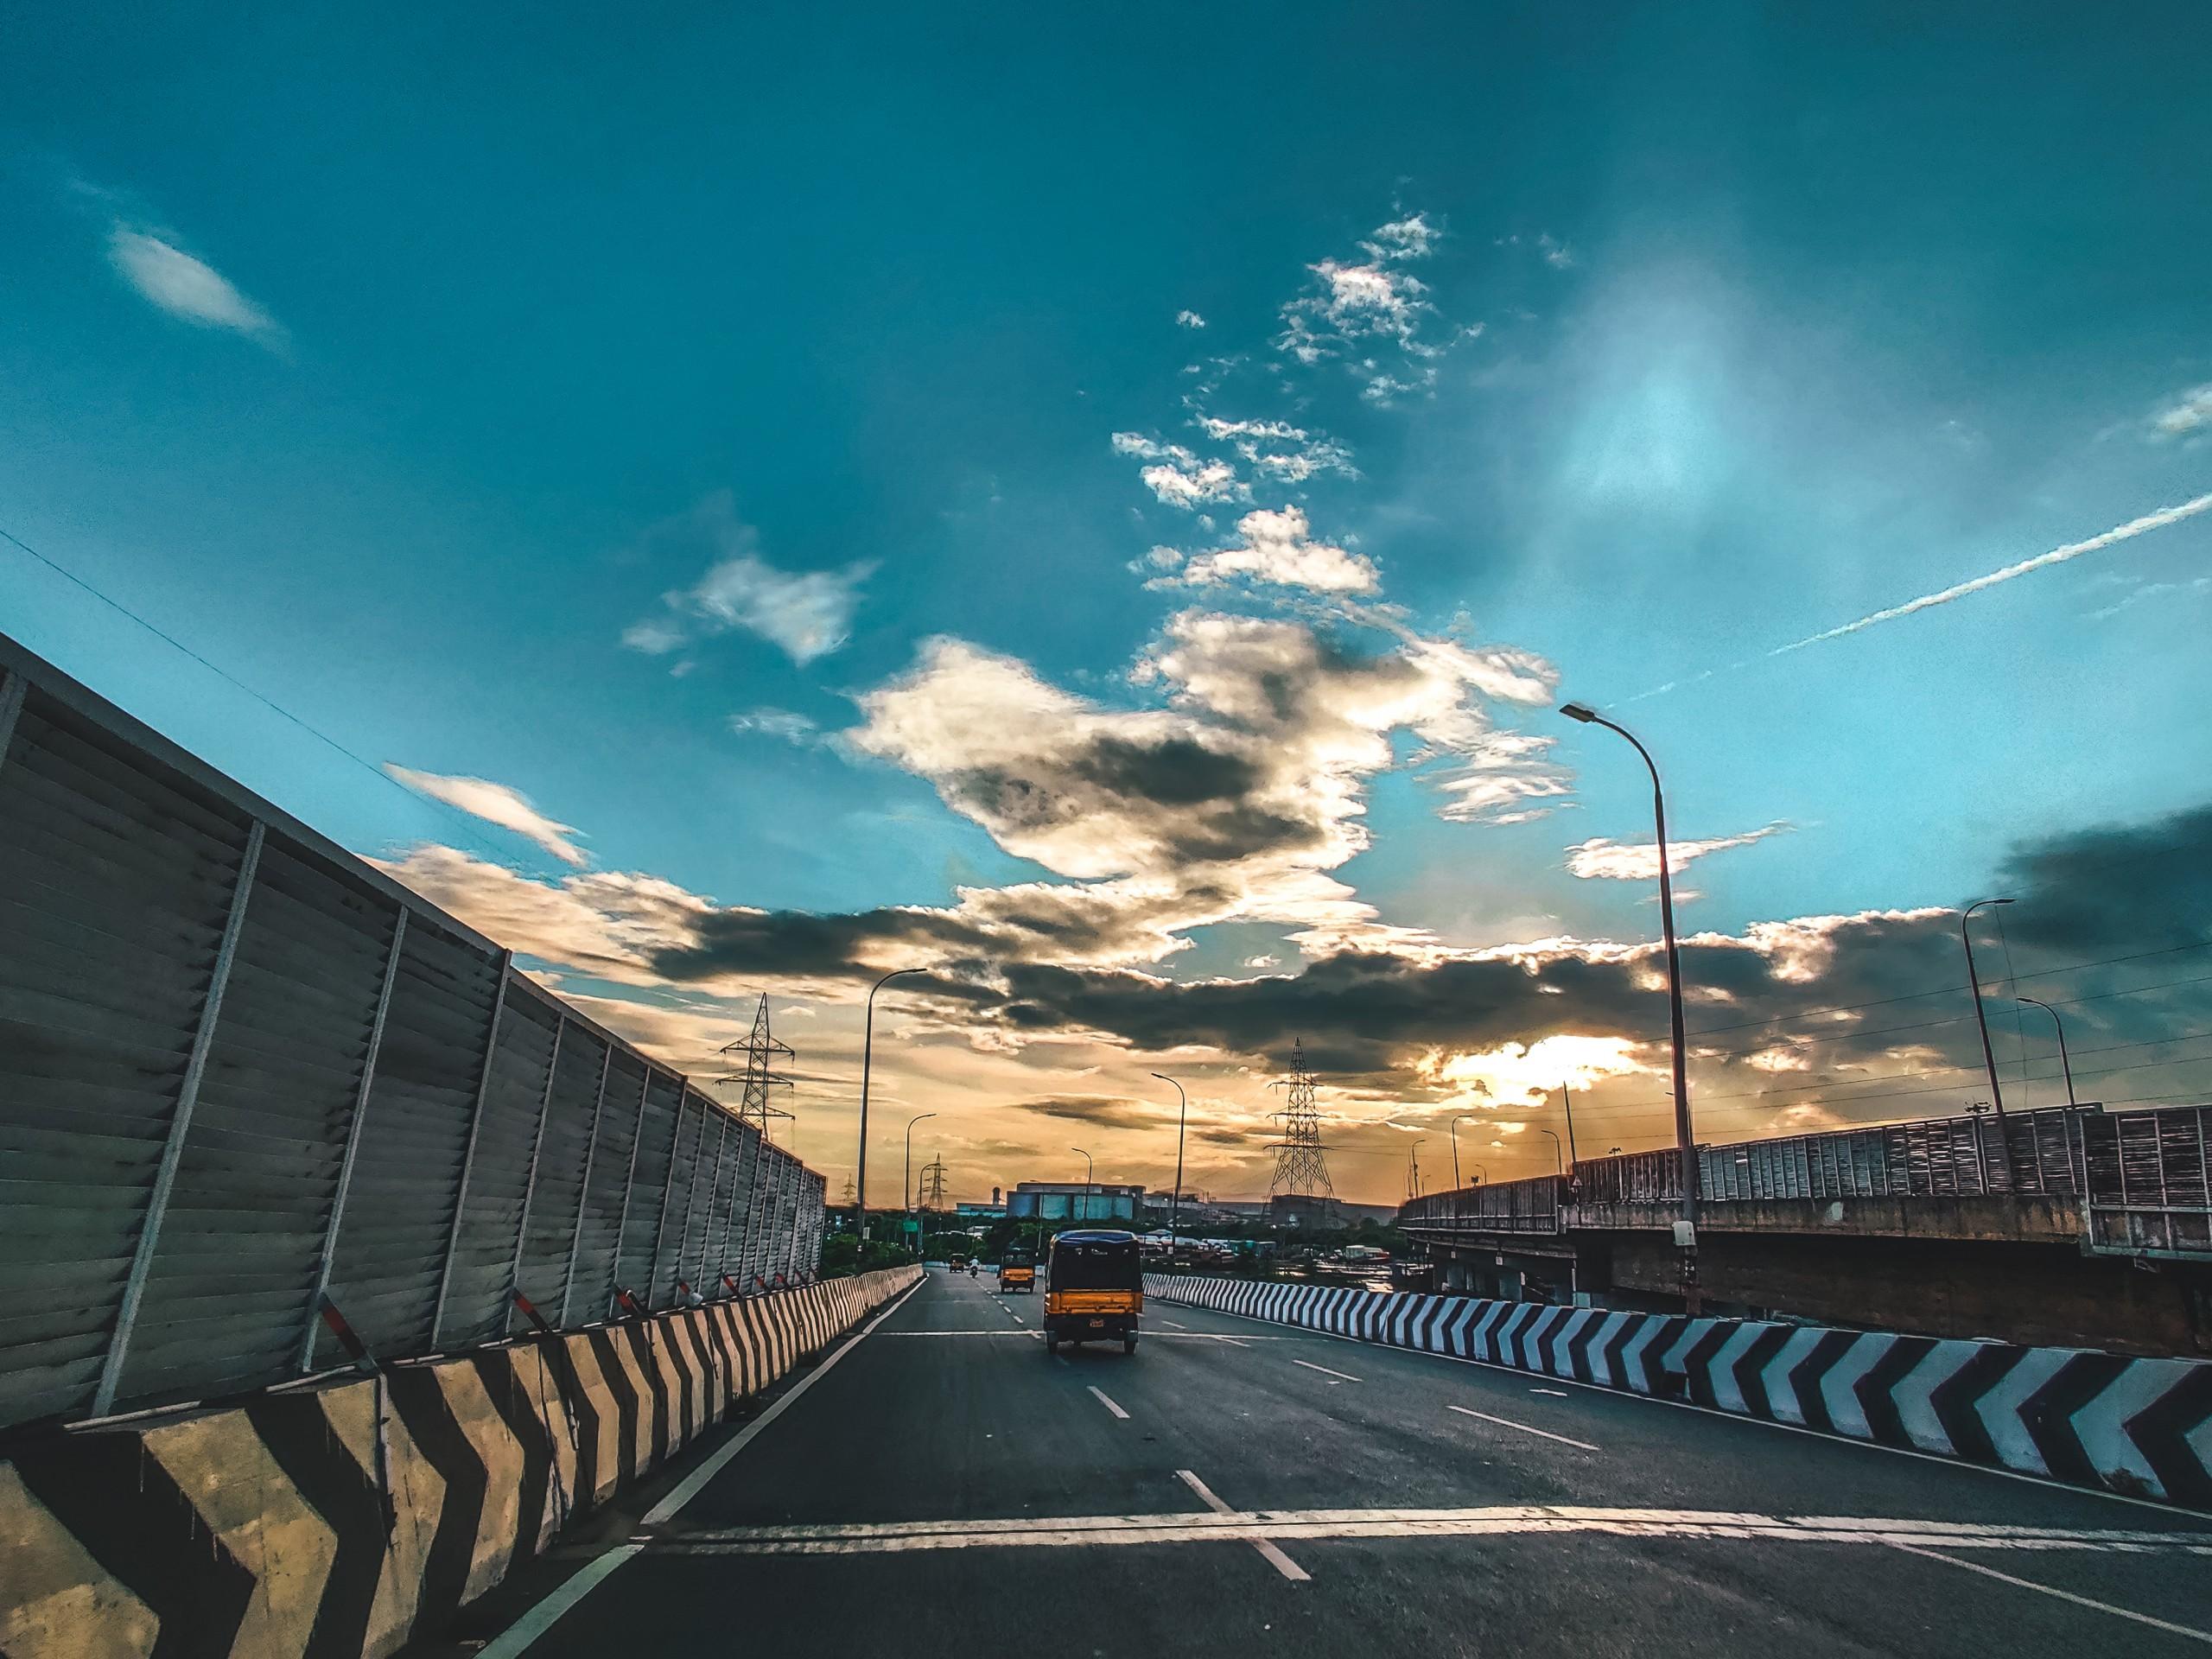 Freeway in a City